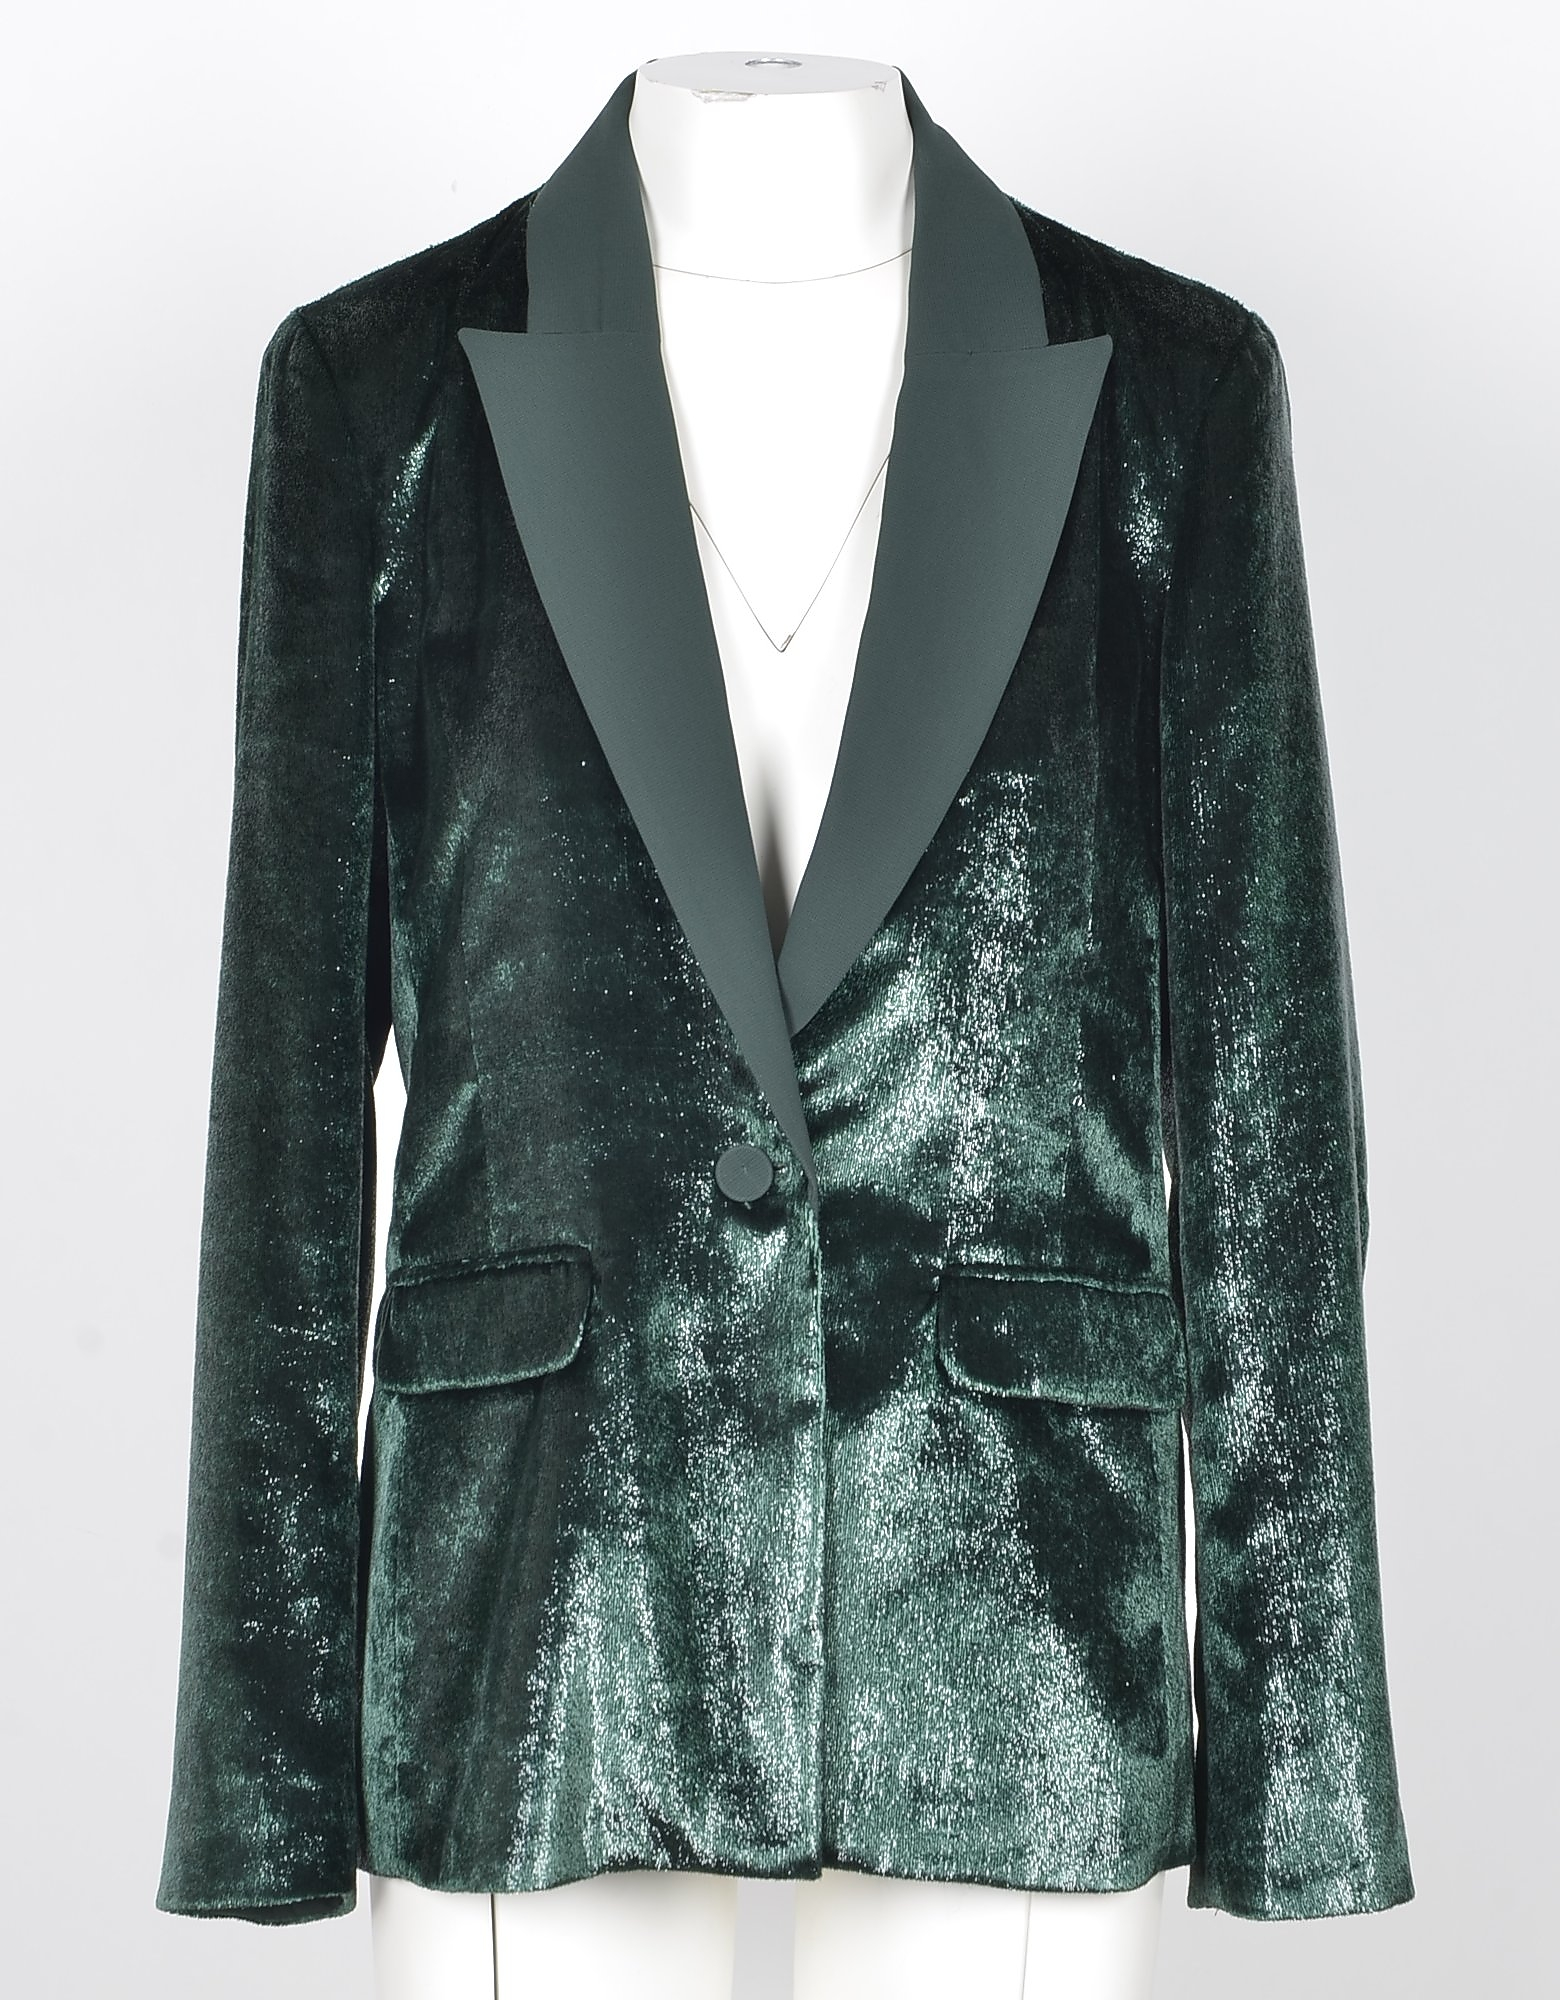 Patrizia Pepe Designer Coats & Jackets, Women's Green Blazer